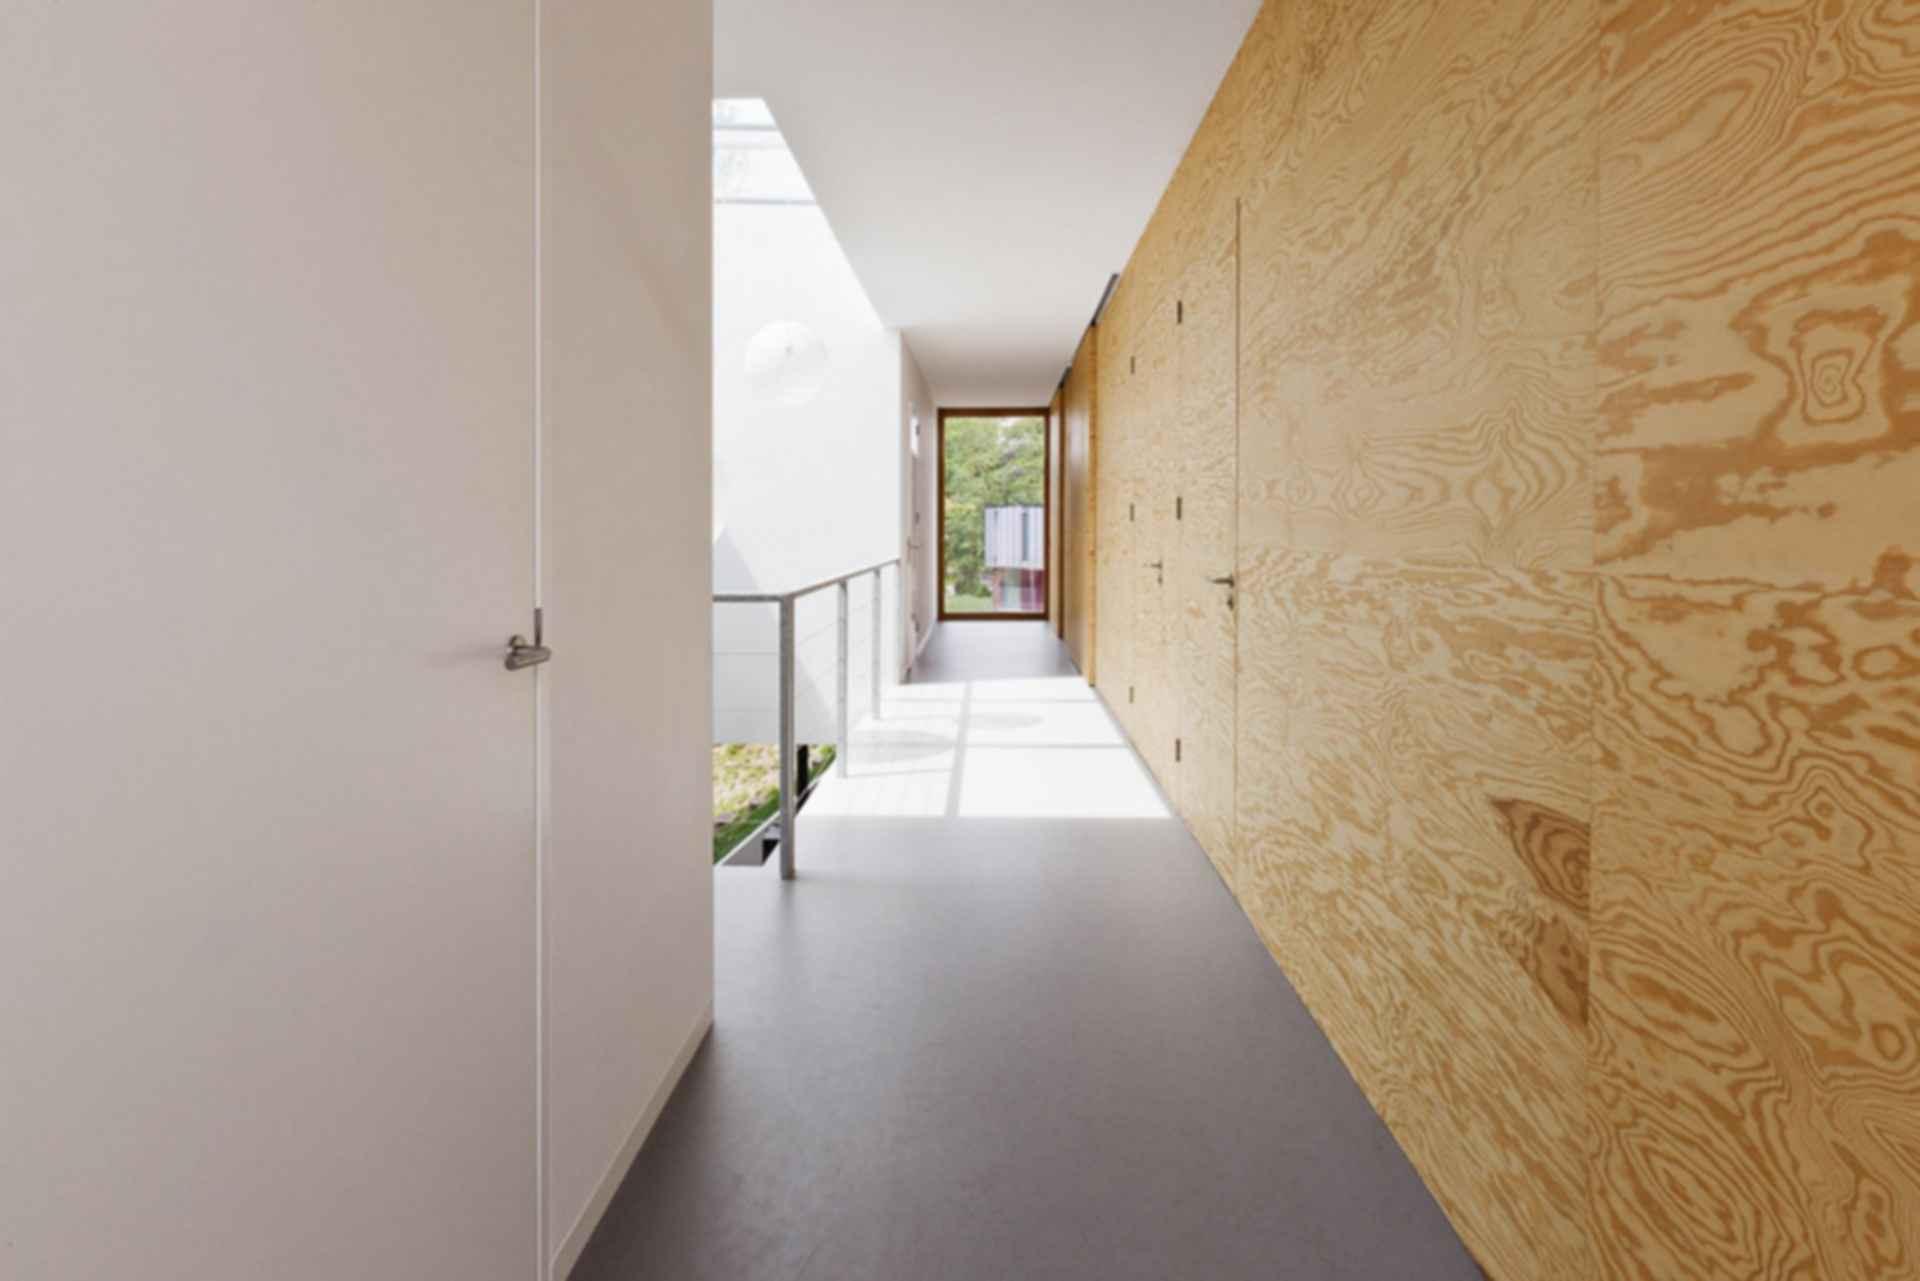 Home 09 - interior/hallway